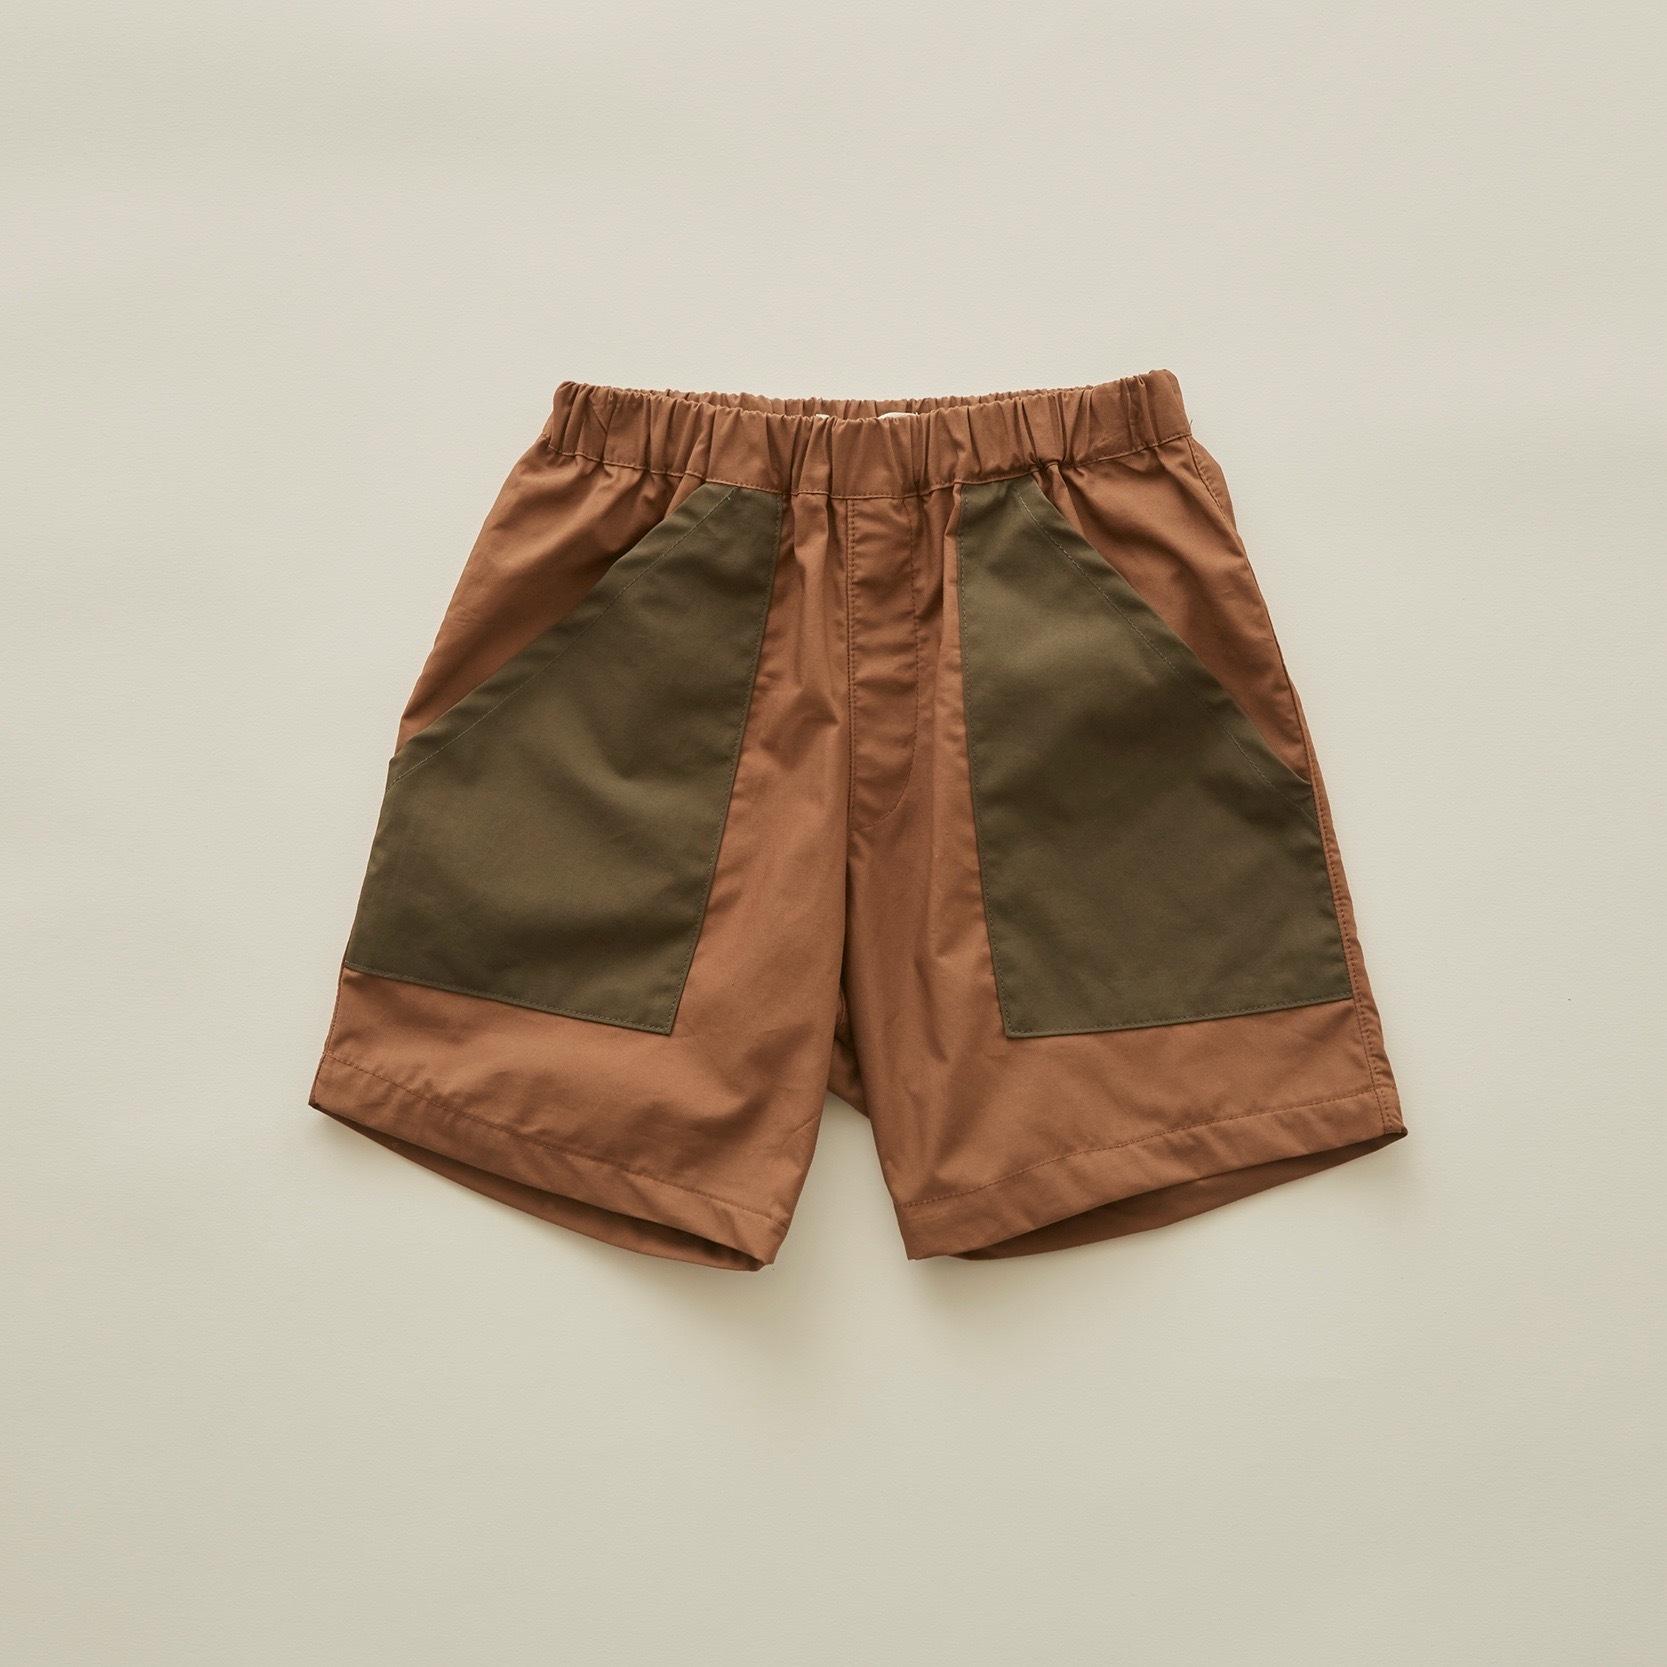 《eLfinFolk 2020SS》typwriter shorts / cocoa / 80-100cm